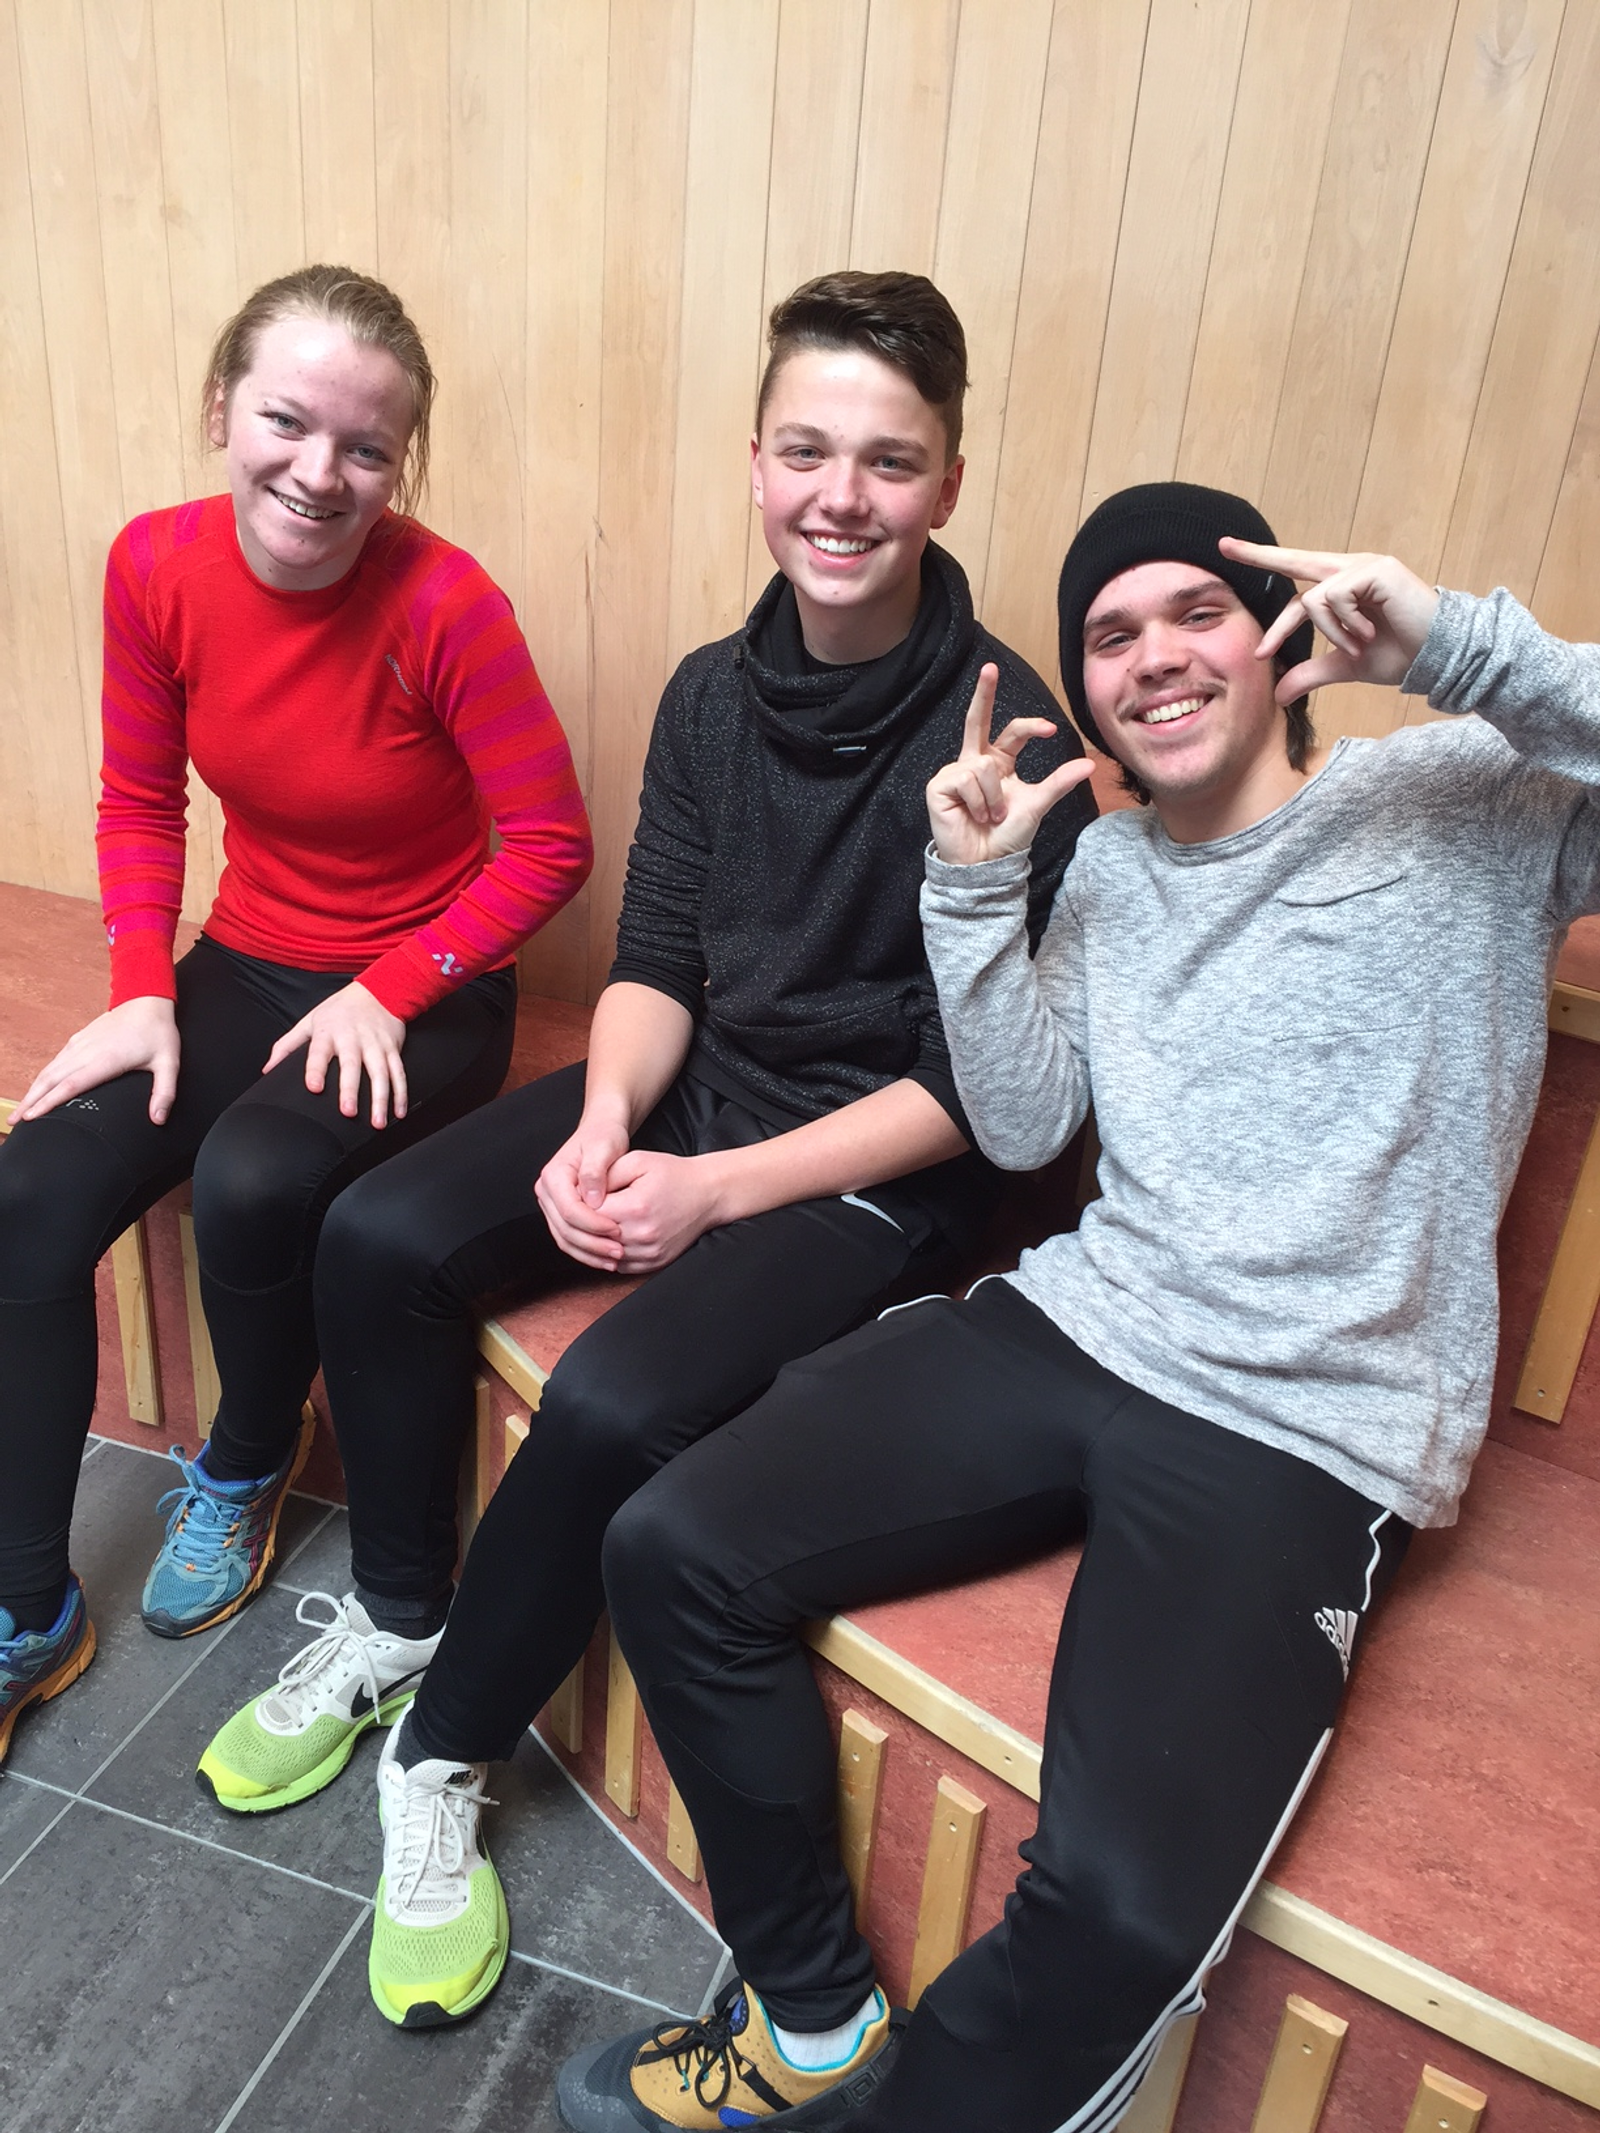 Maria Wangen, Carl Hellberg Johansen og Simon Setherberget Ruud fra Eidskog ungdomsskole fikk ni rette.